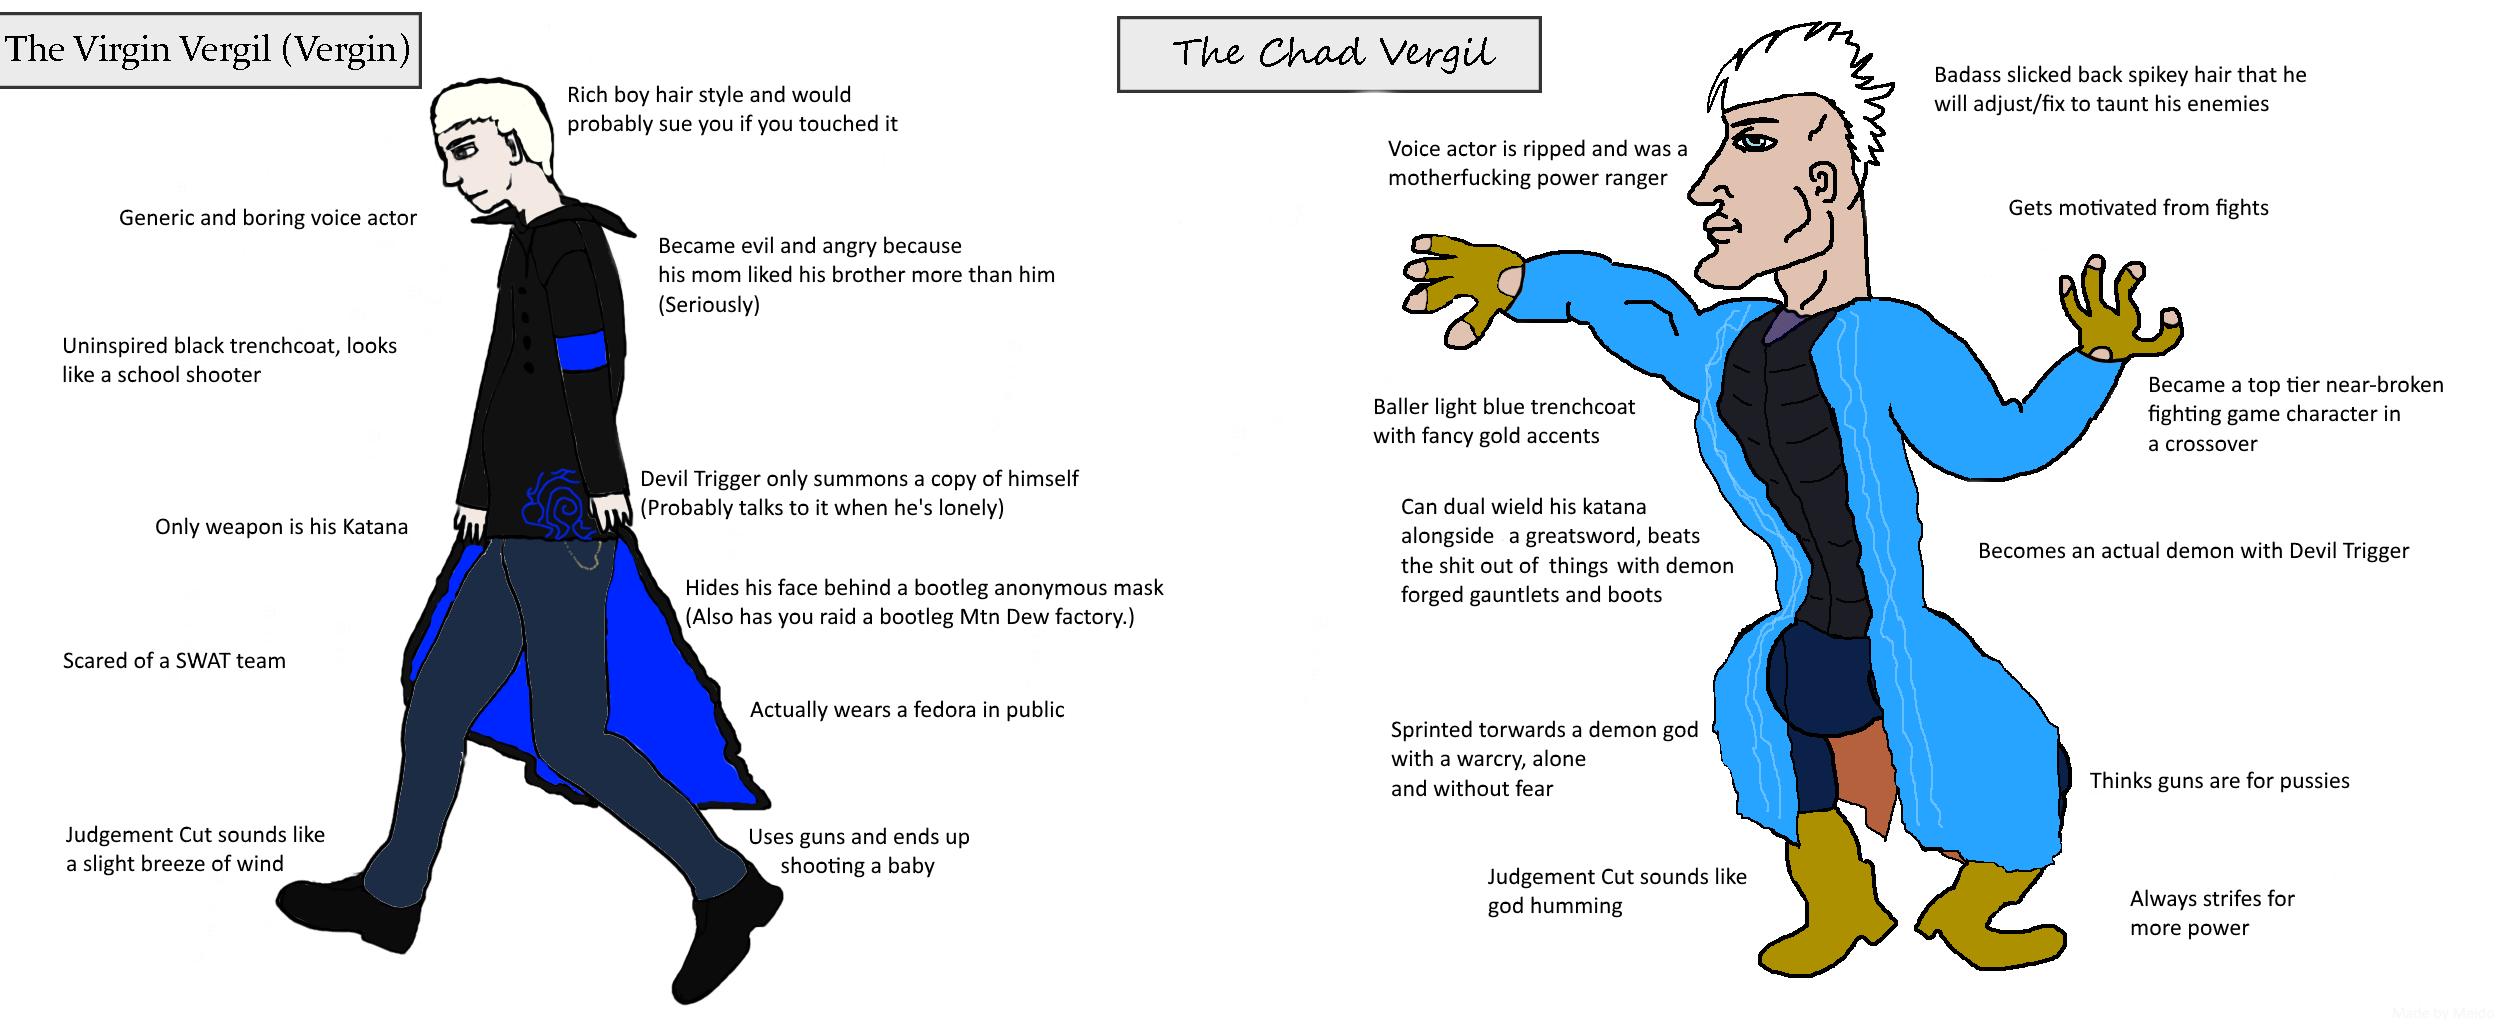 Virgin Vergil Vs Chad Vergil Virgin Vs Chad Know Your Meme